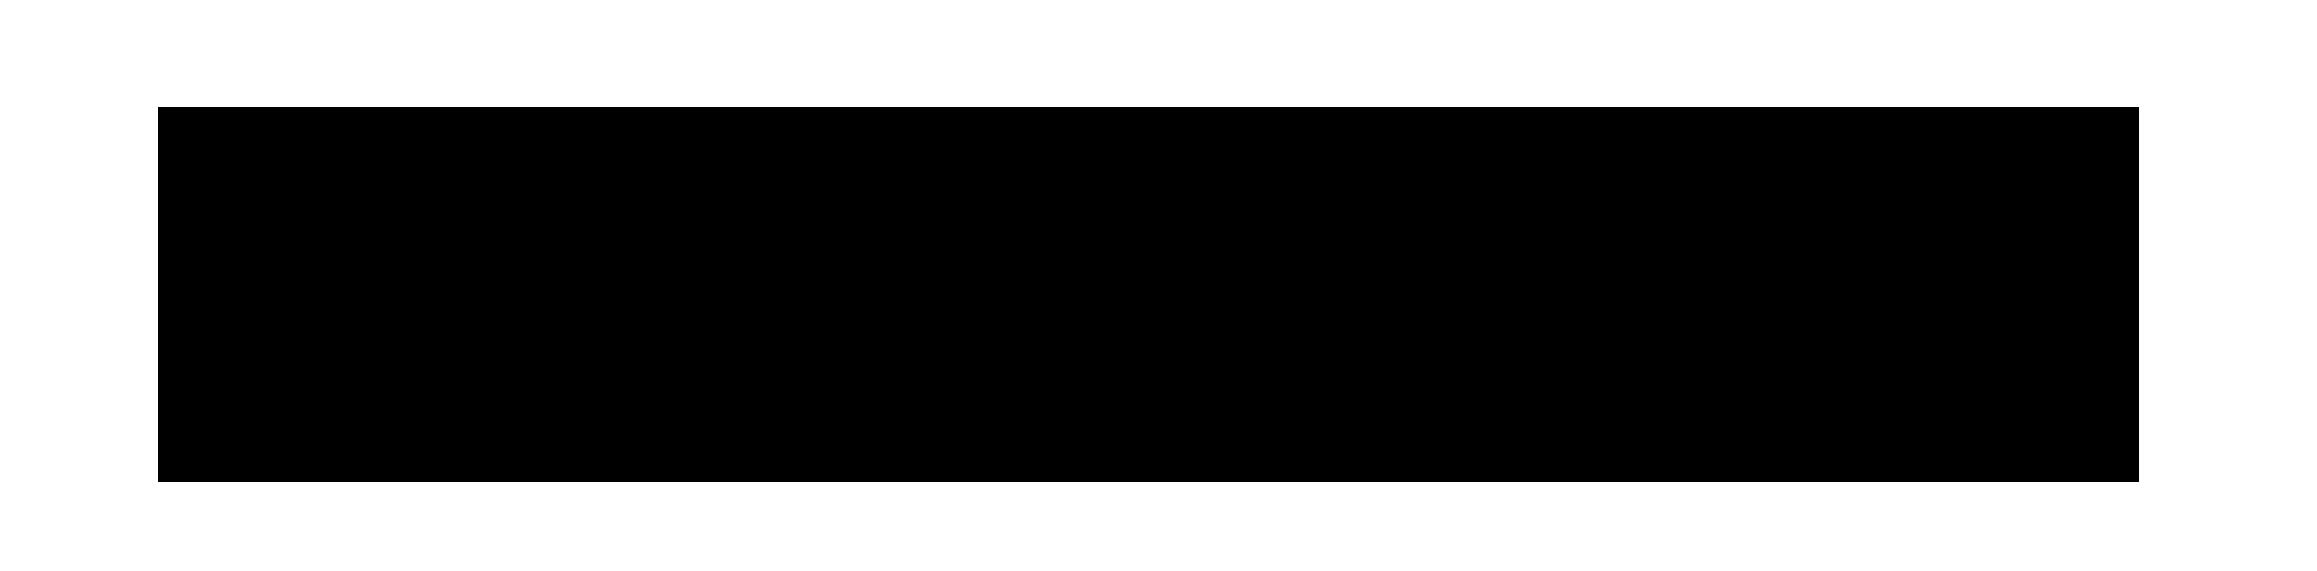 LOGO - black PNG